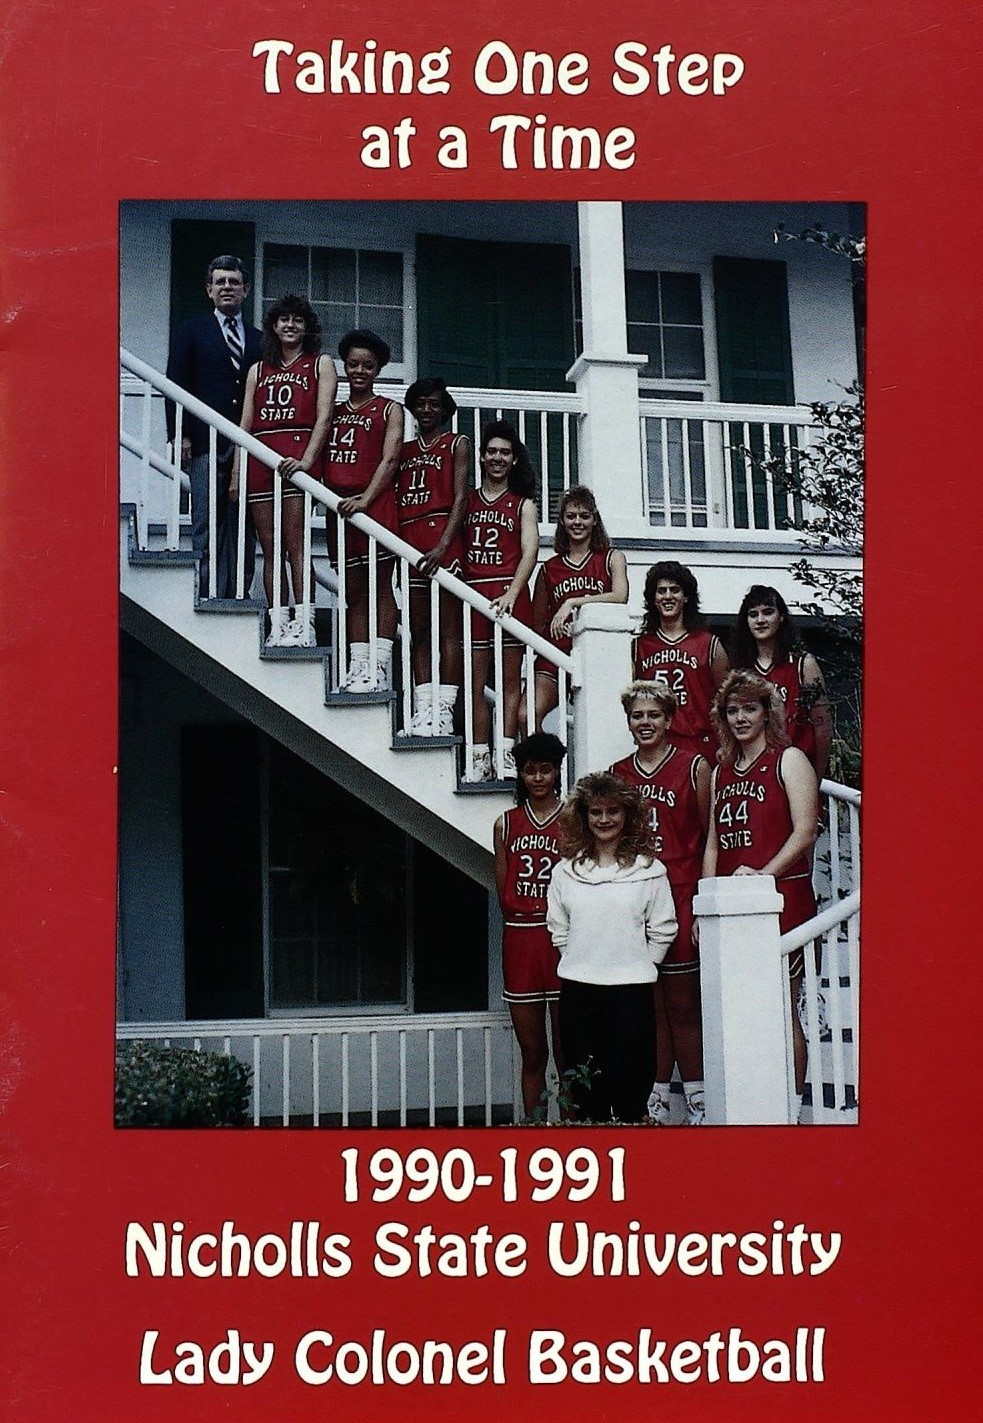 1990-1991 Program Cover